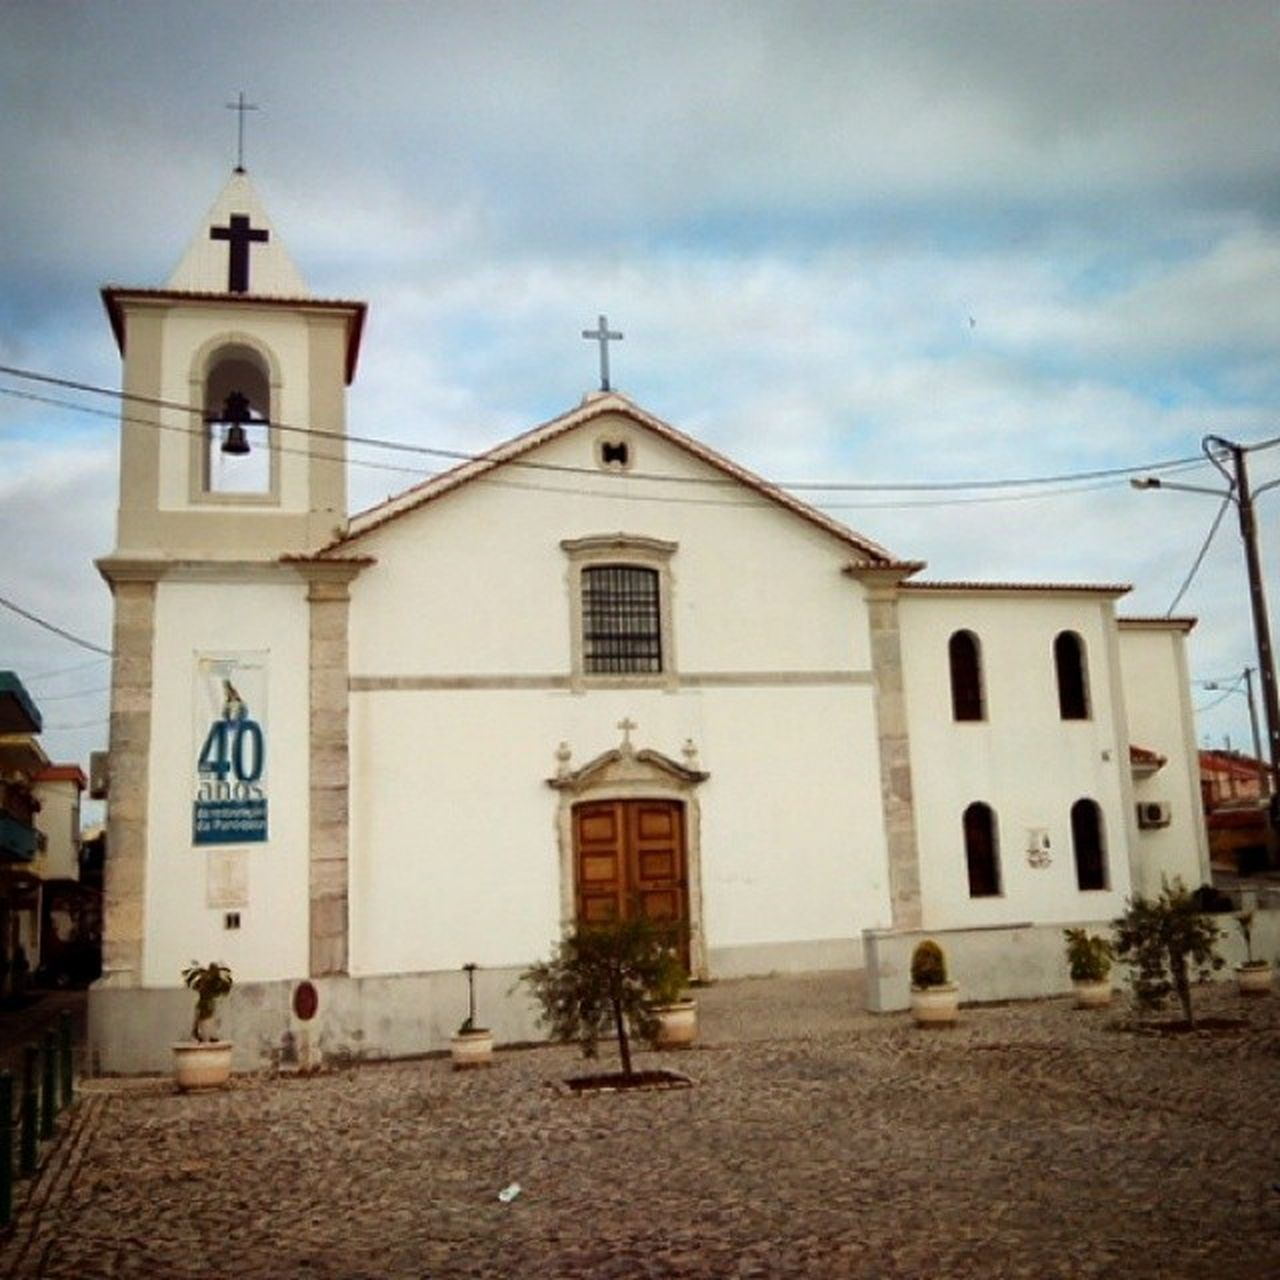 Igreja de Nossa Senhora da Graça Corroios God Church Waw portugal